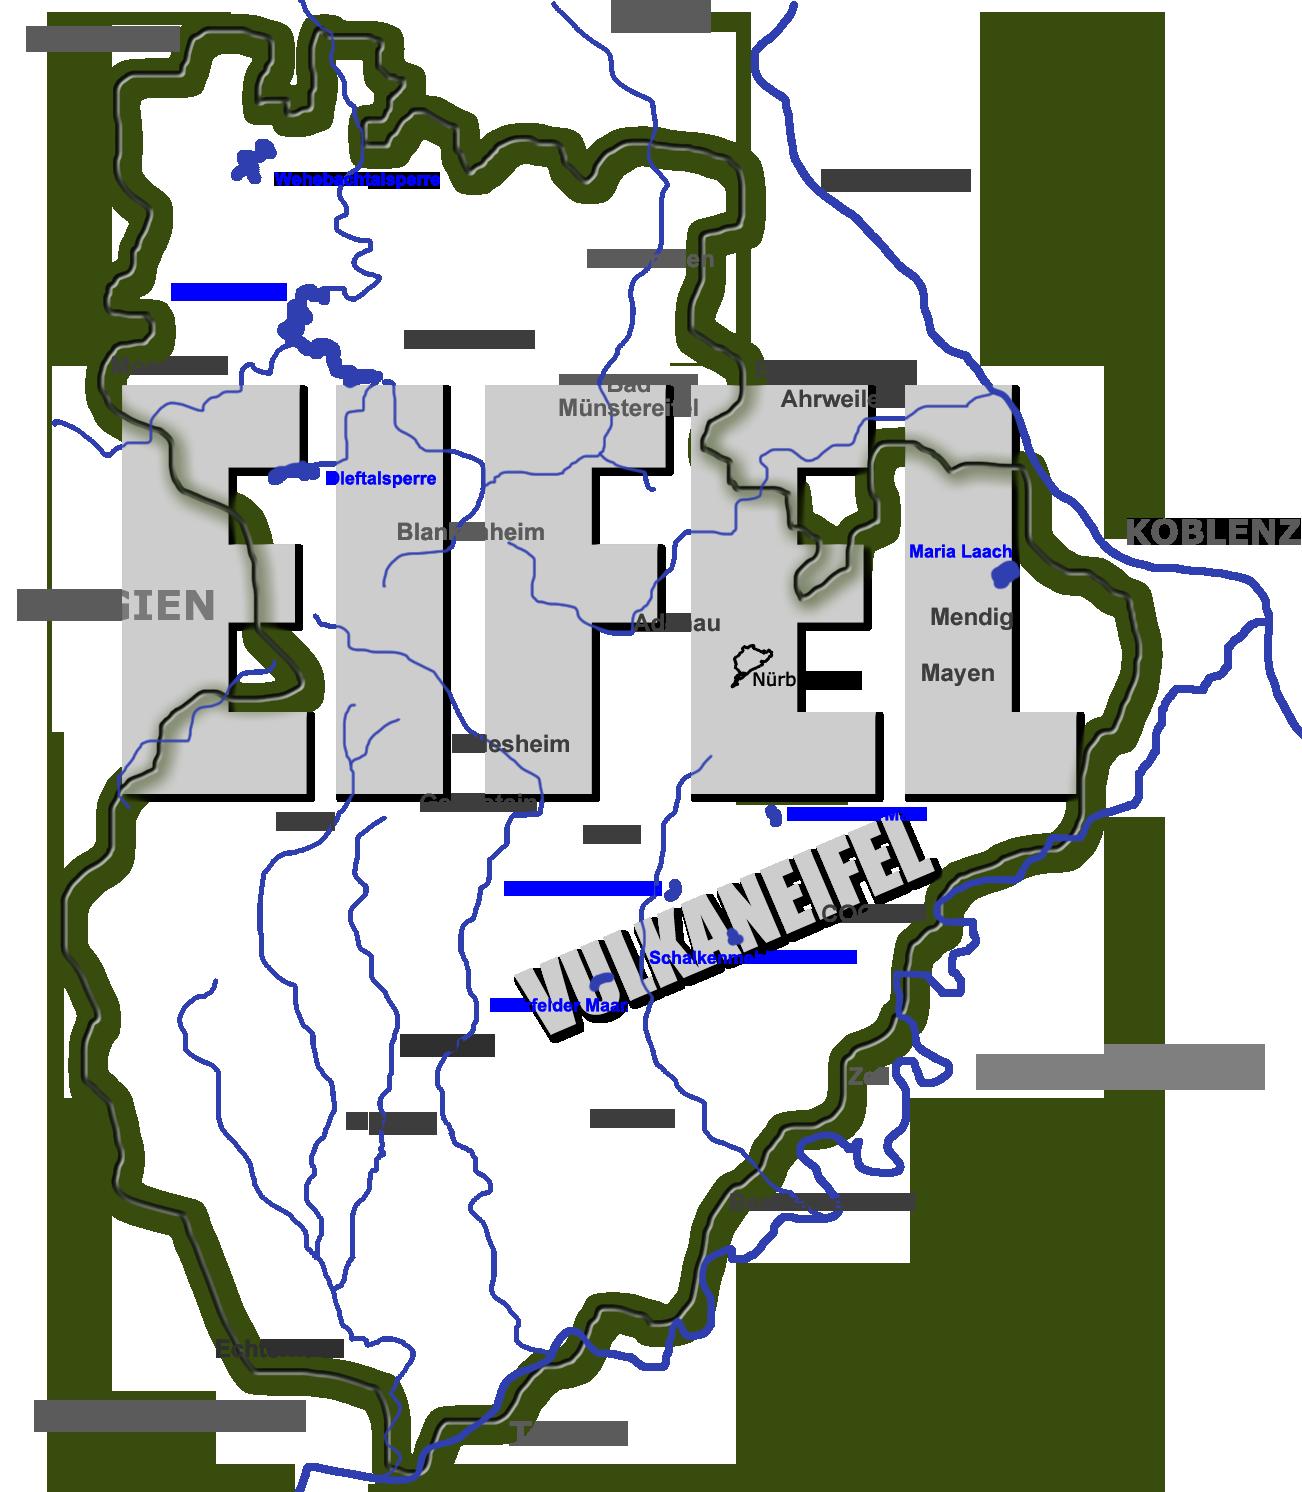 Nationalpark Eifel Karte.Landkarte Der Eifel